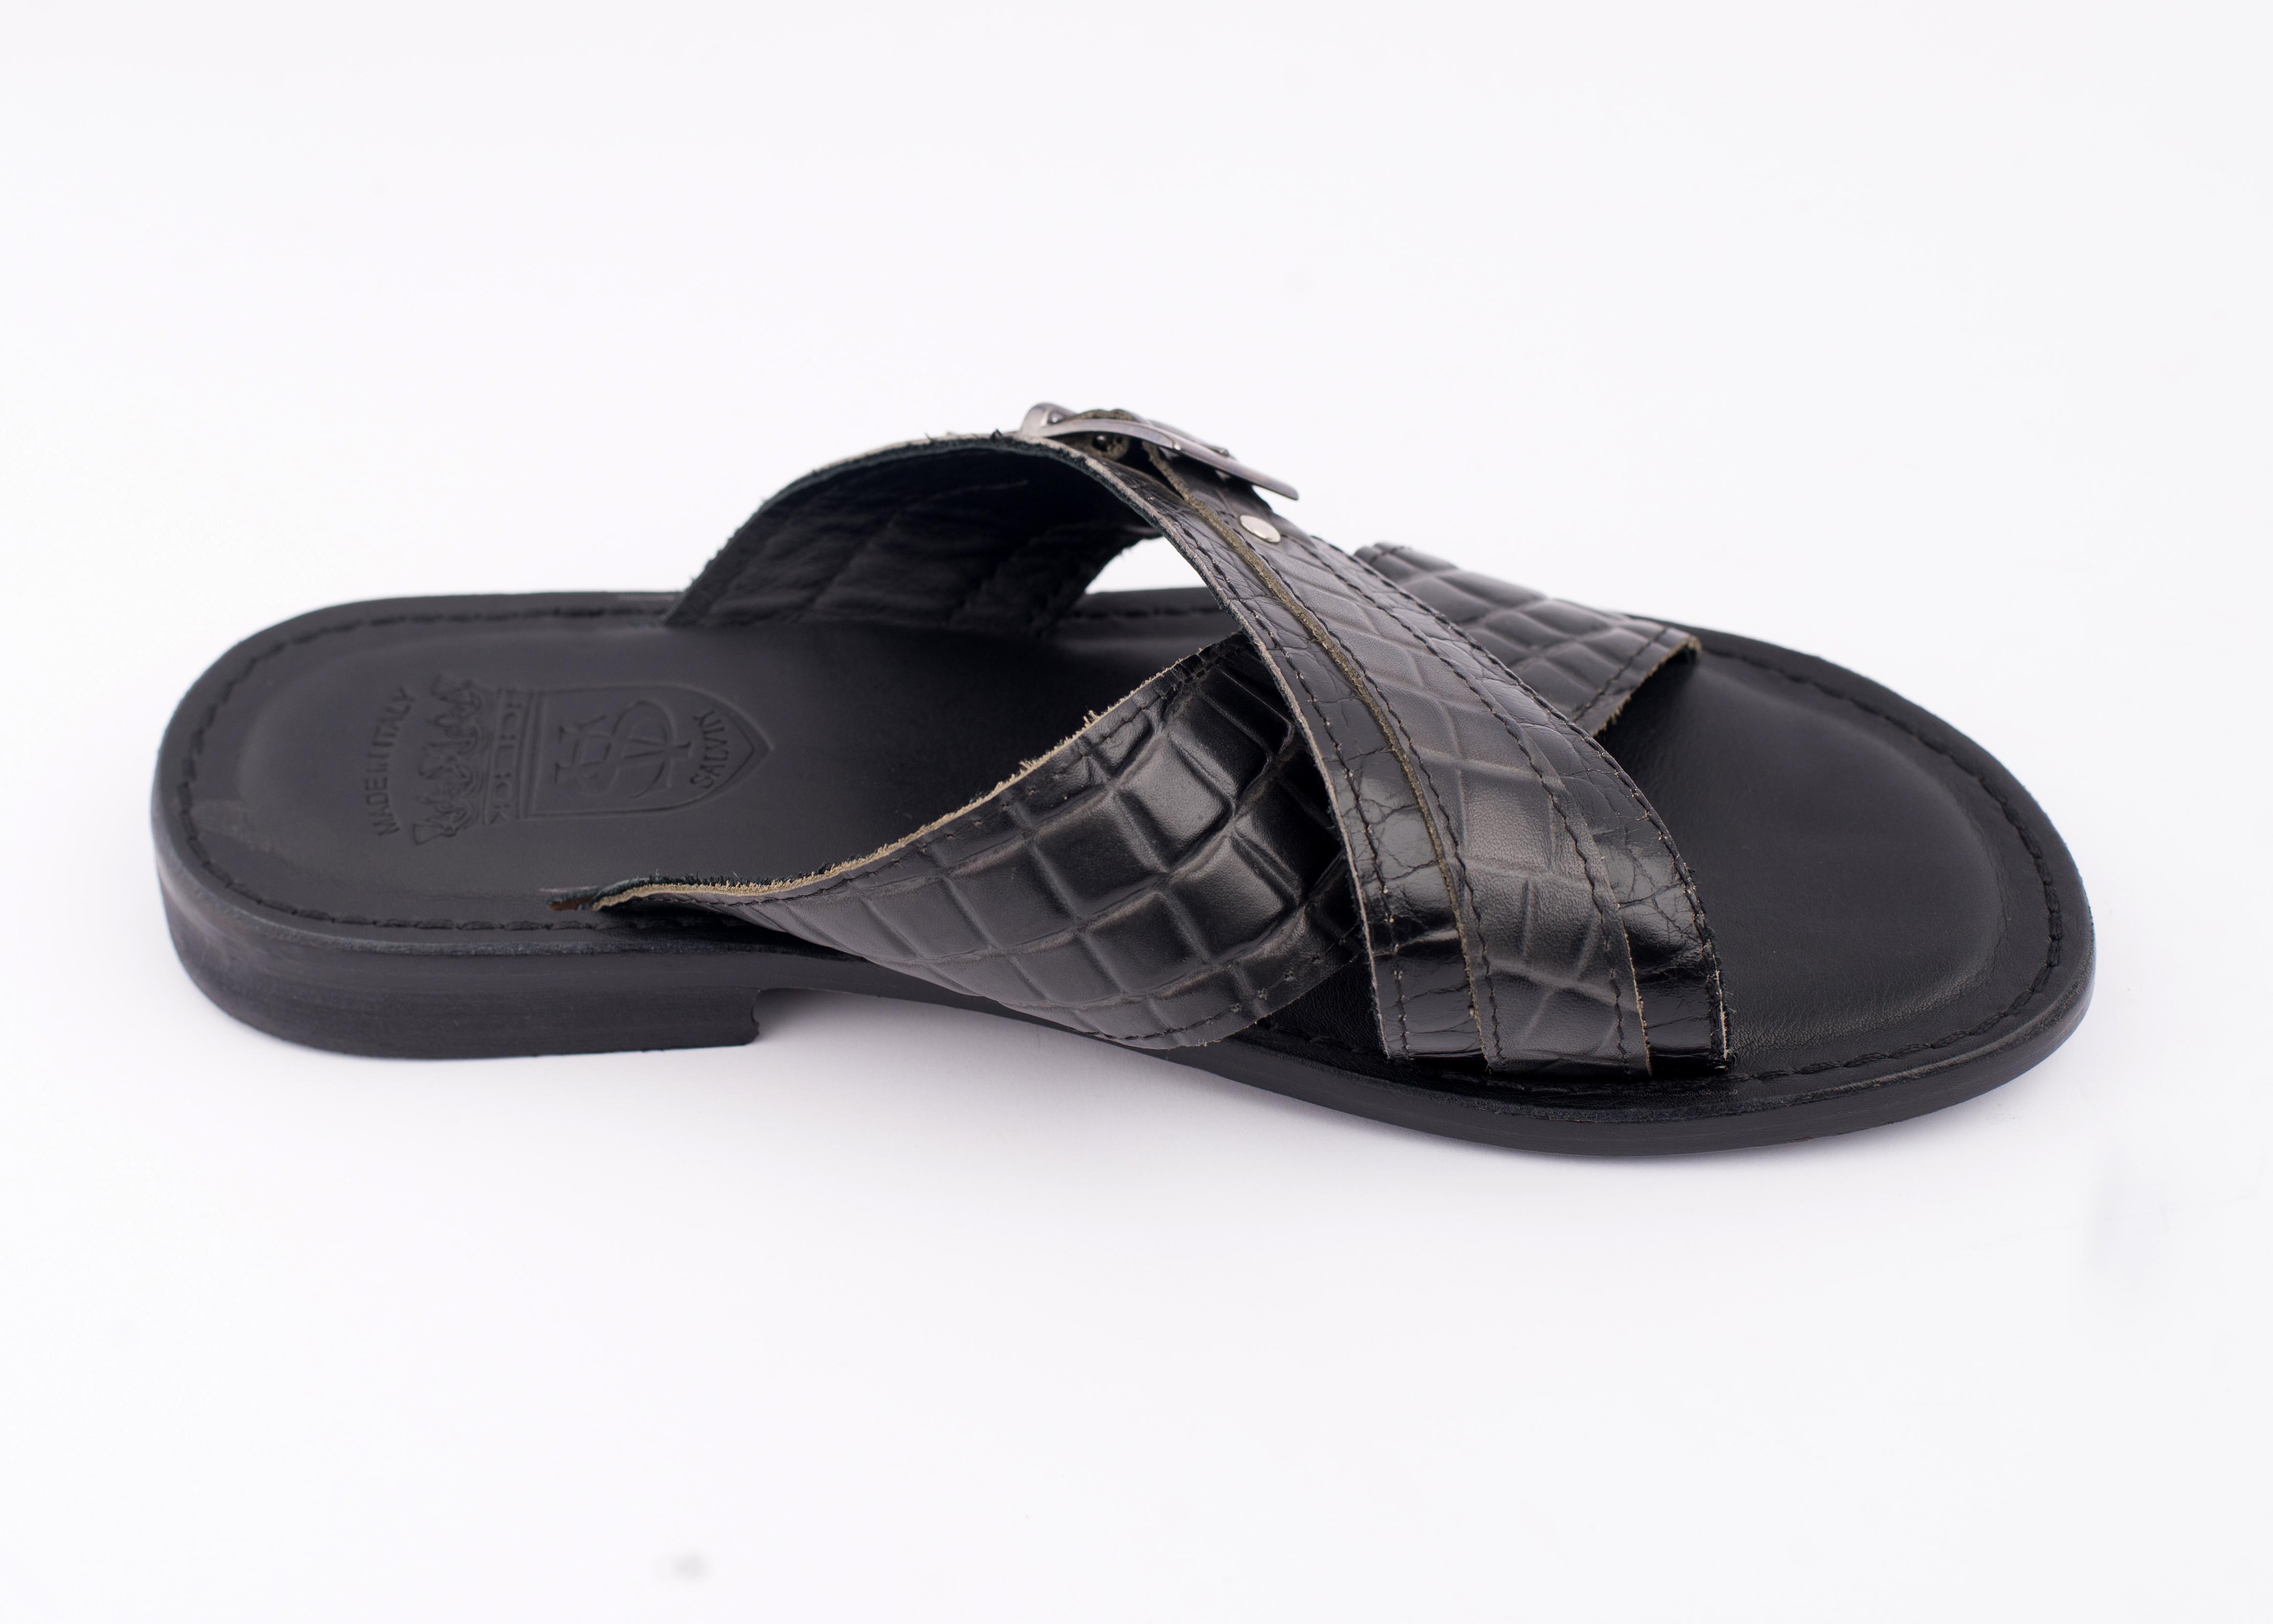 def4a6790a9 SALVIN PALM SLIPPERS. – Greno Fashion World